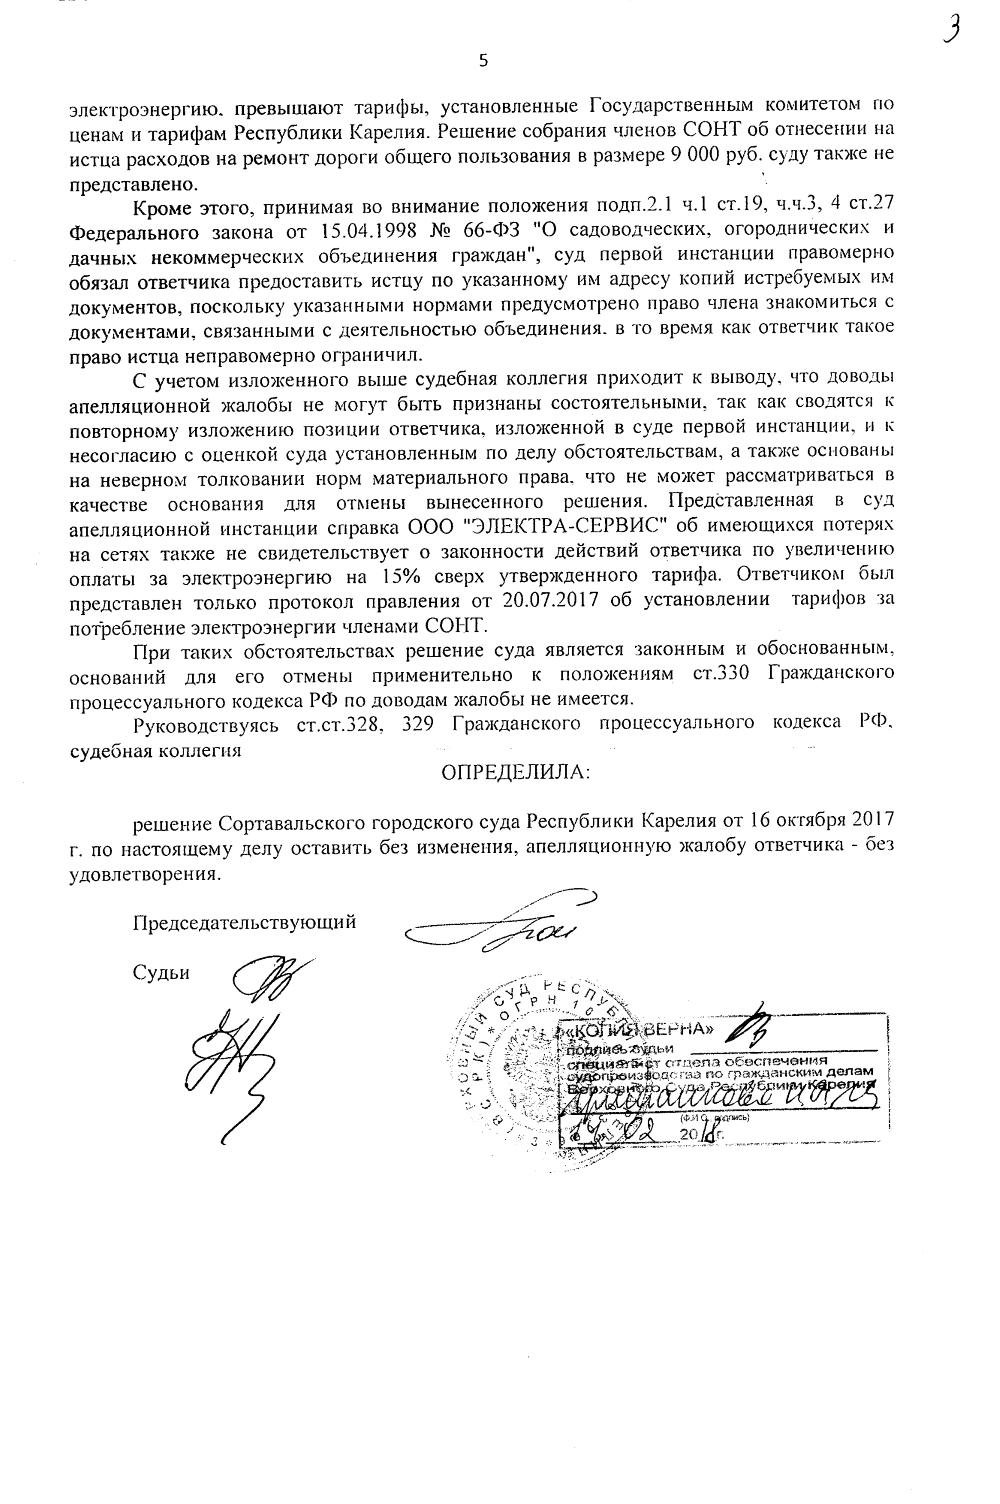 https://sontgranit.ru/forum/img/sokol/20180123-апелляционное-определение-вс-6.png